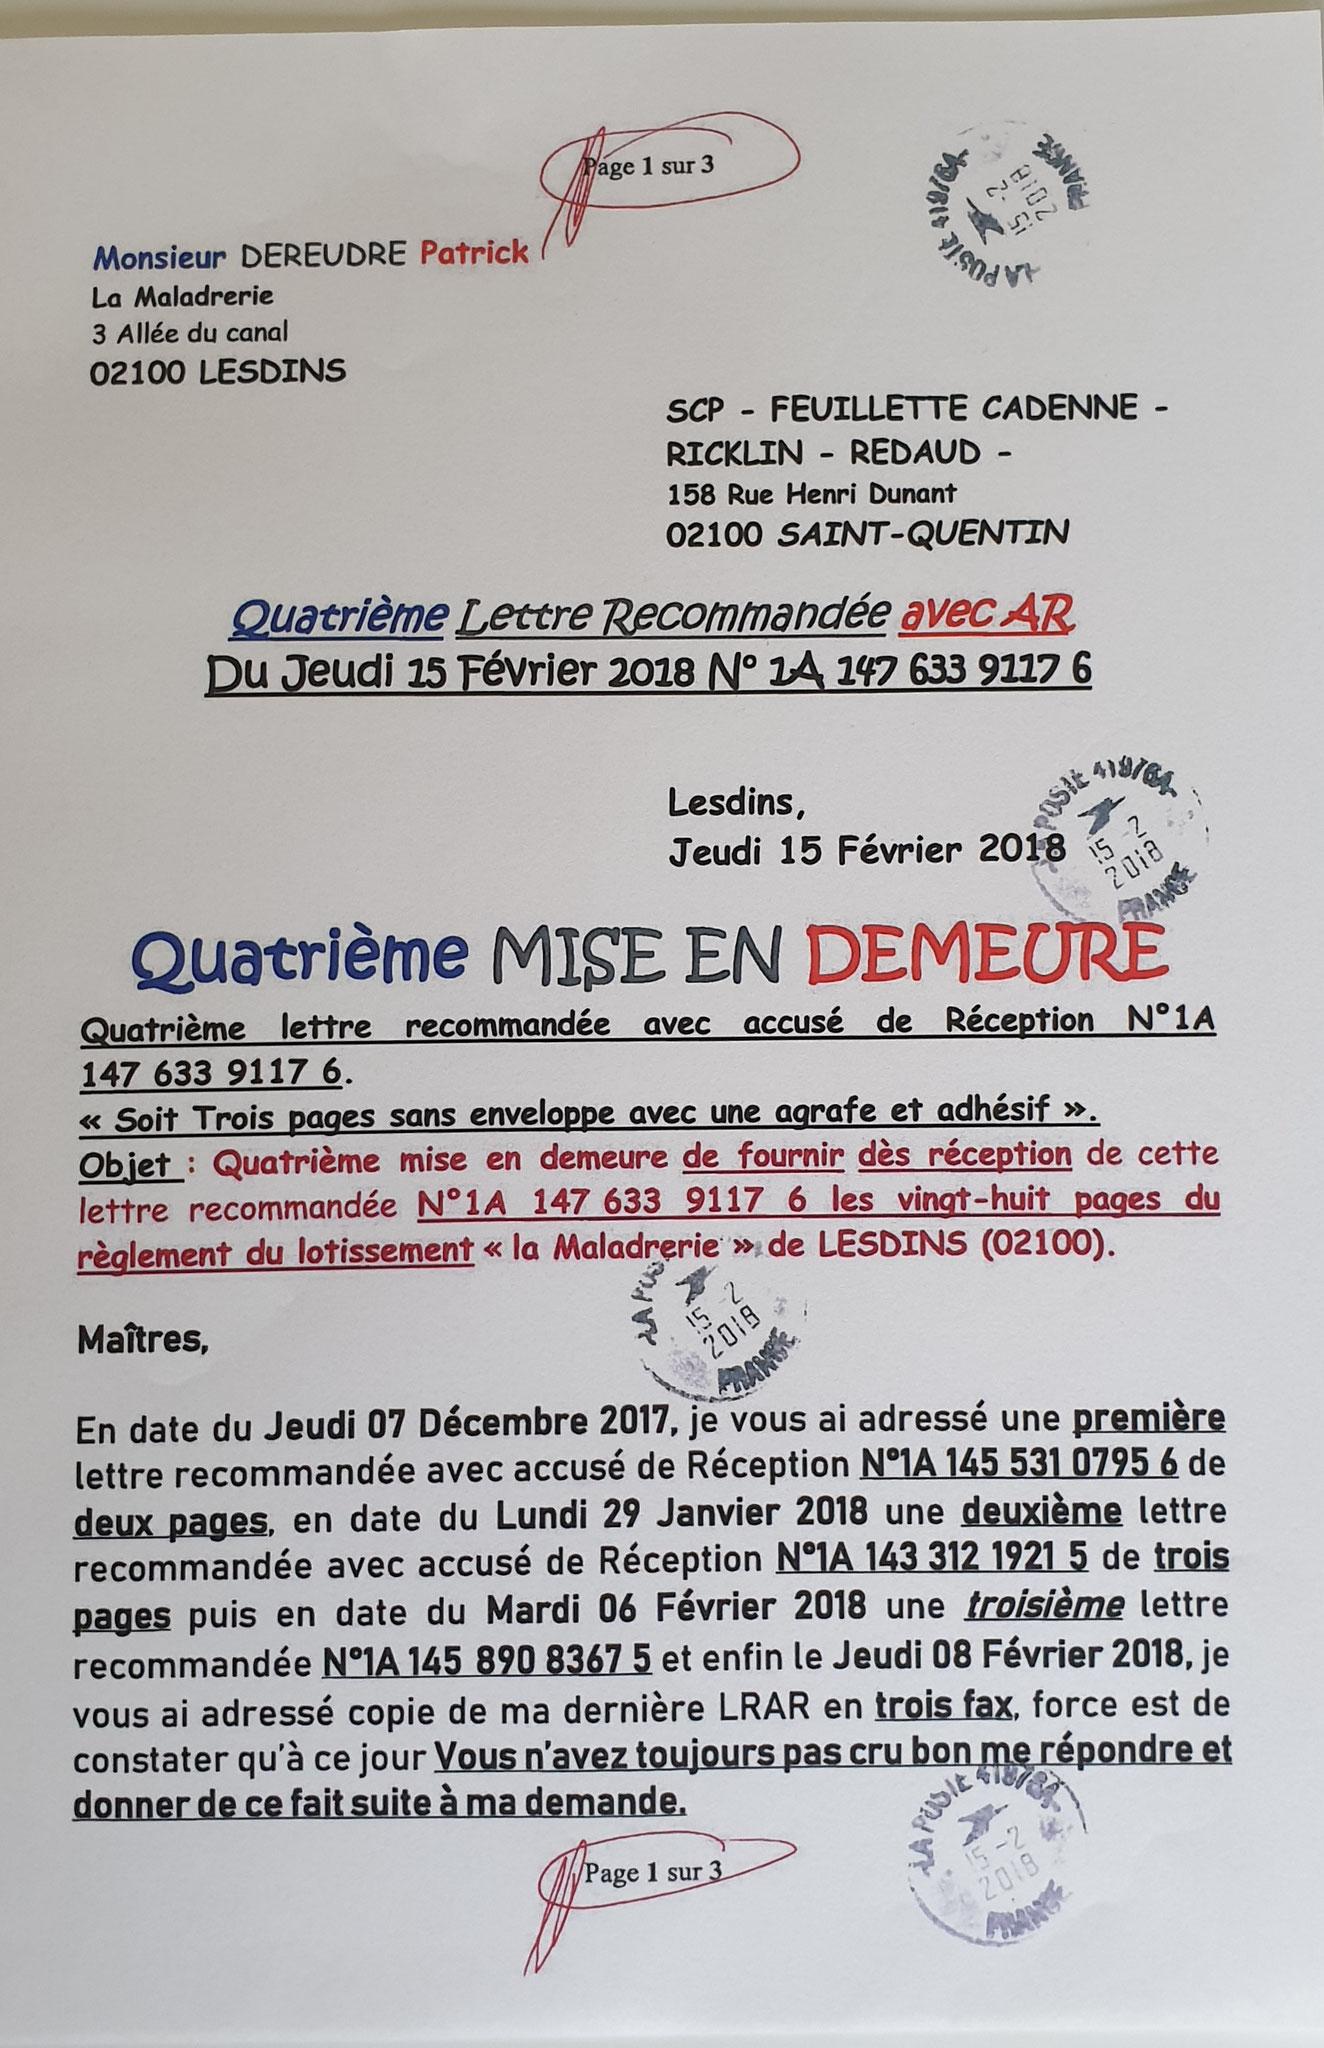 Le 15 Février 2018 Quatrième LRAR N0 1A 147 633 9117 6 (trois pages) www.jenesuispasunchien.fr www.jesuisvictime.fr www.jesuispatrick.fr